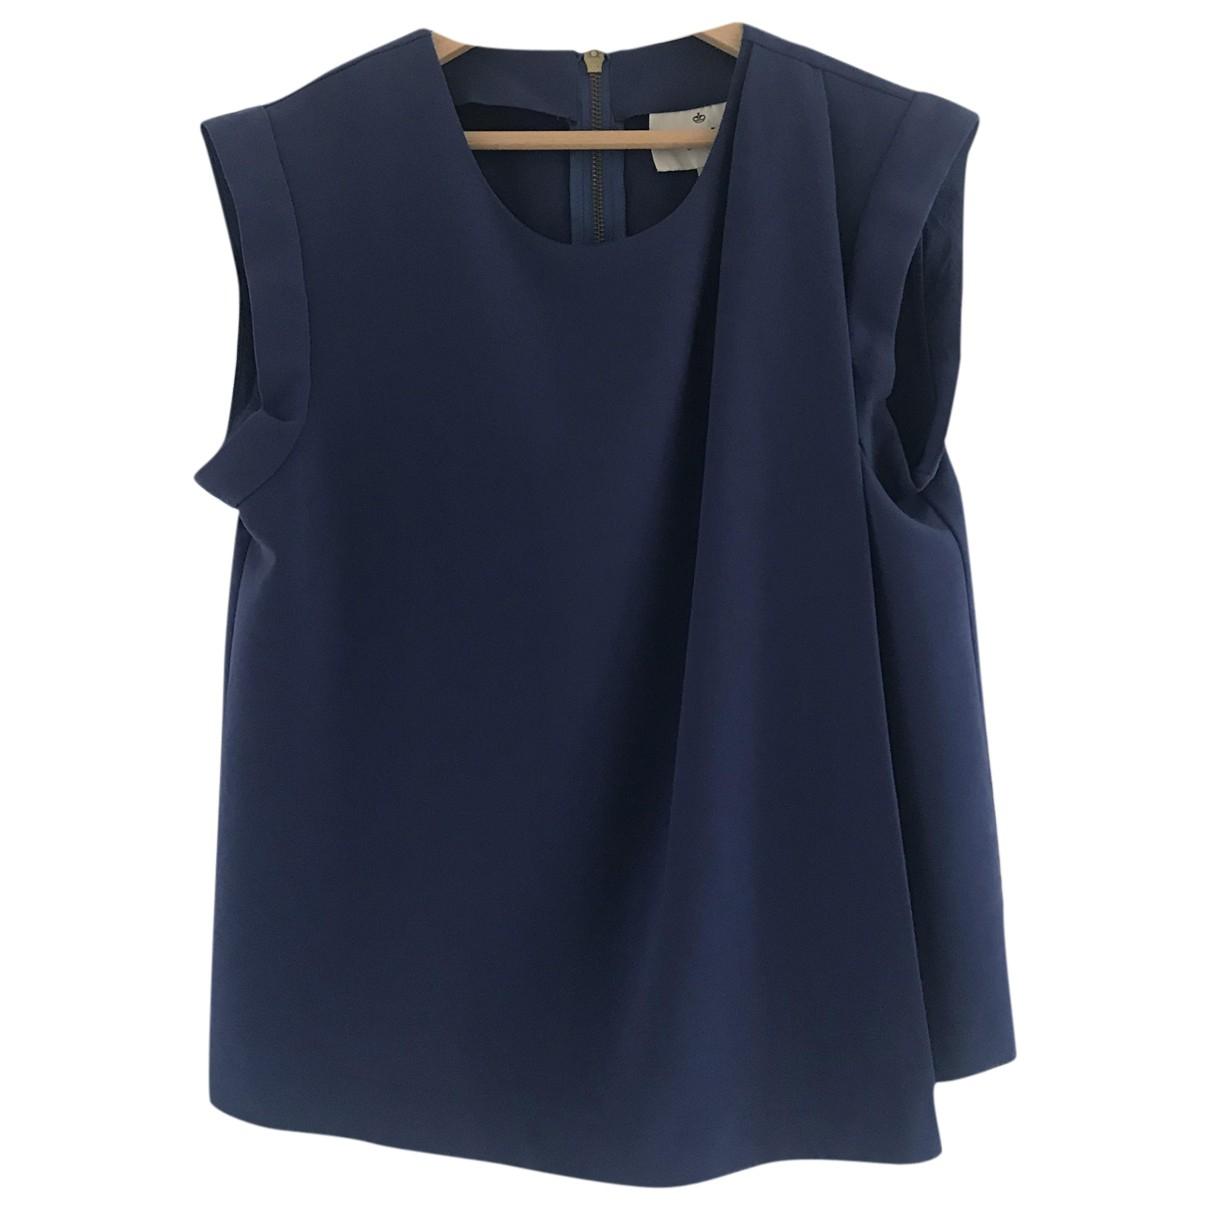 Essentiel Antwerp - Top   pour femme - bleu